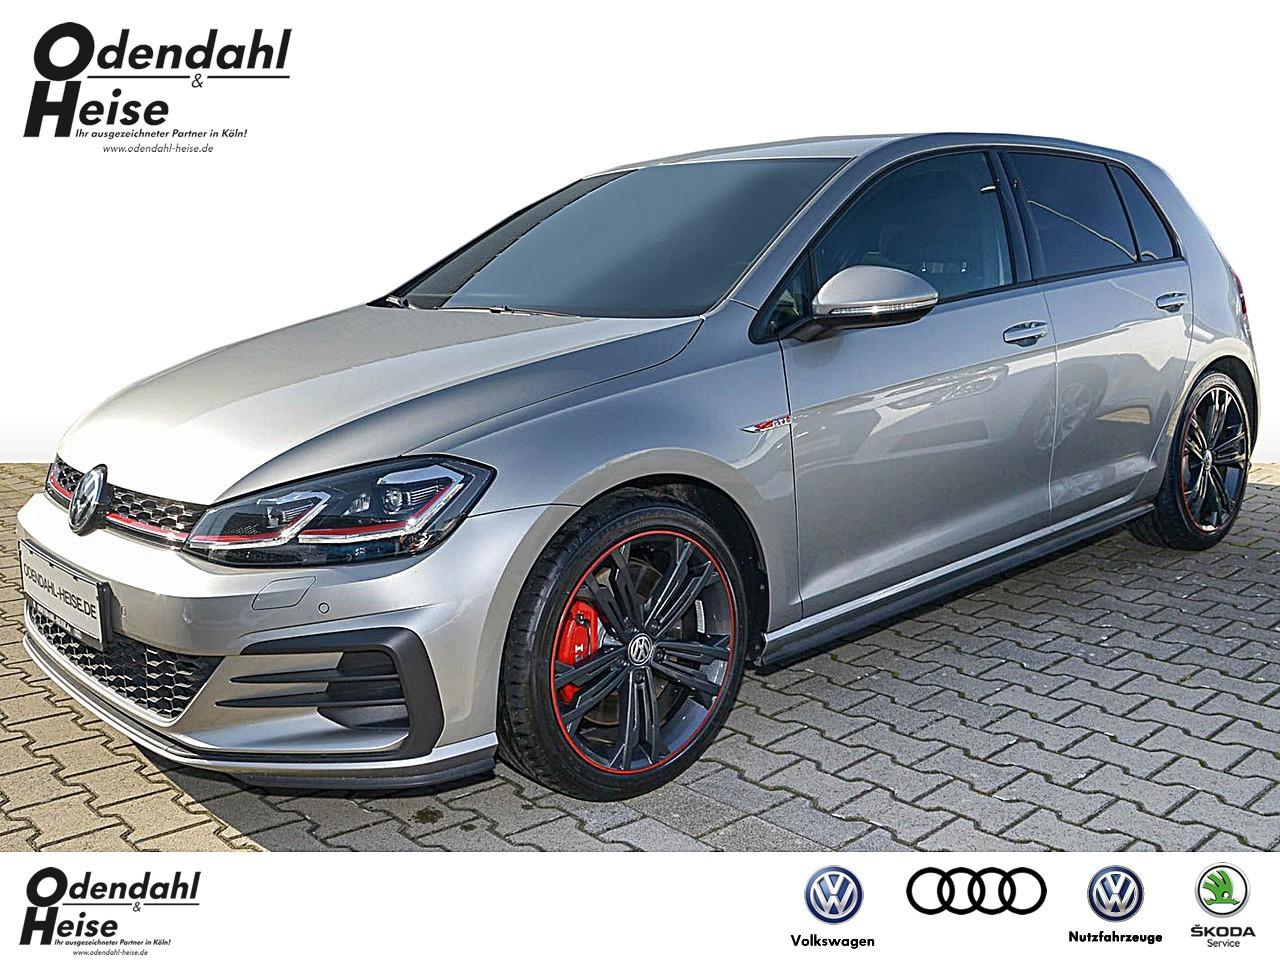 Volkswagen Golf VII GTI 2,0 TSI DSG Performance Klima Navi, Jahr 2019, Benzin